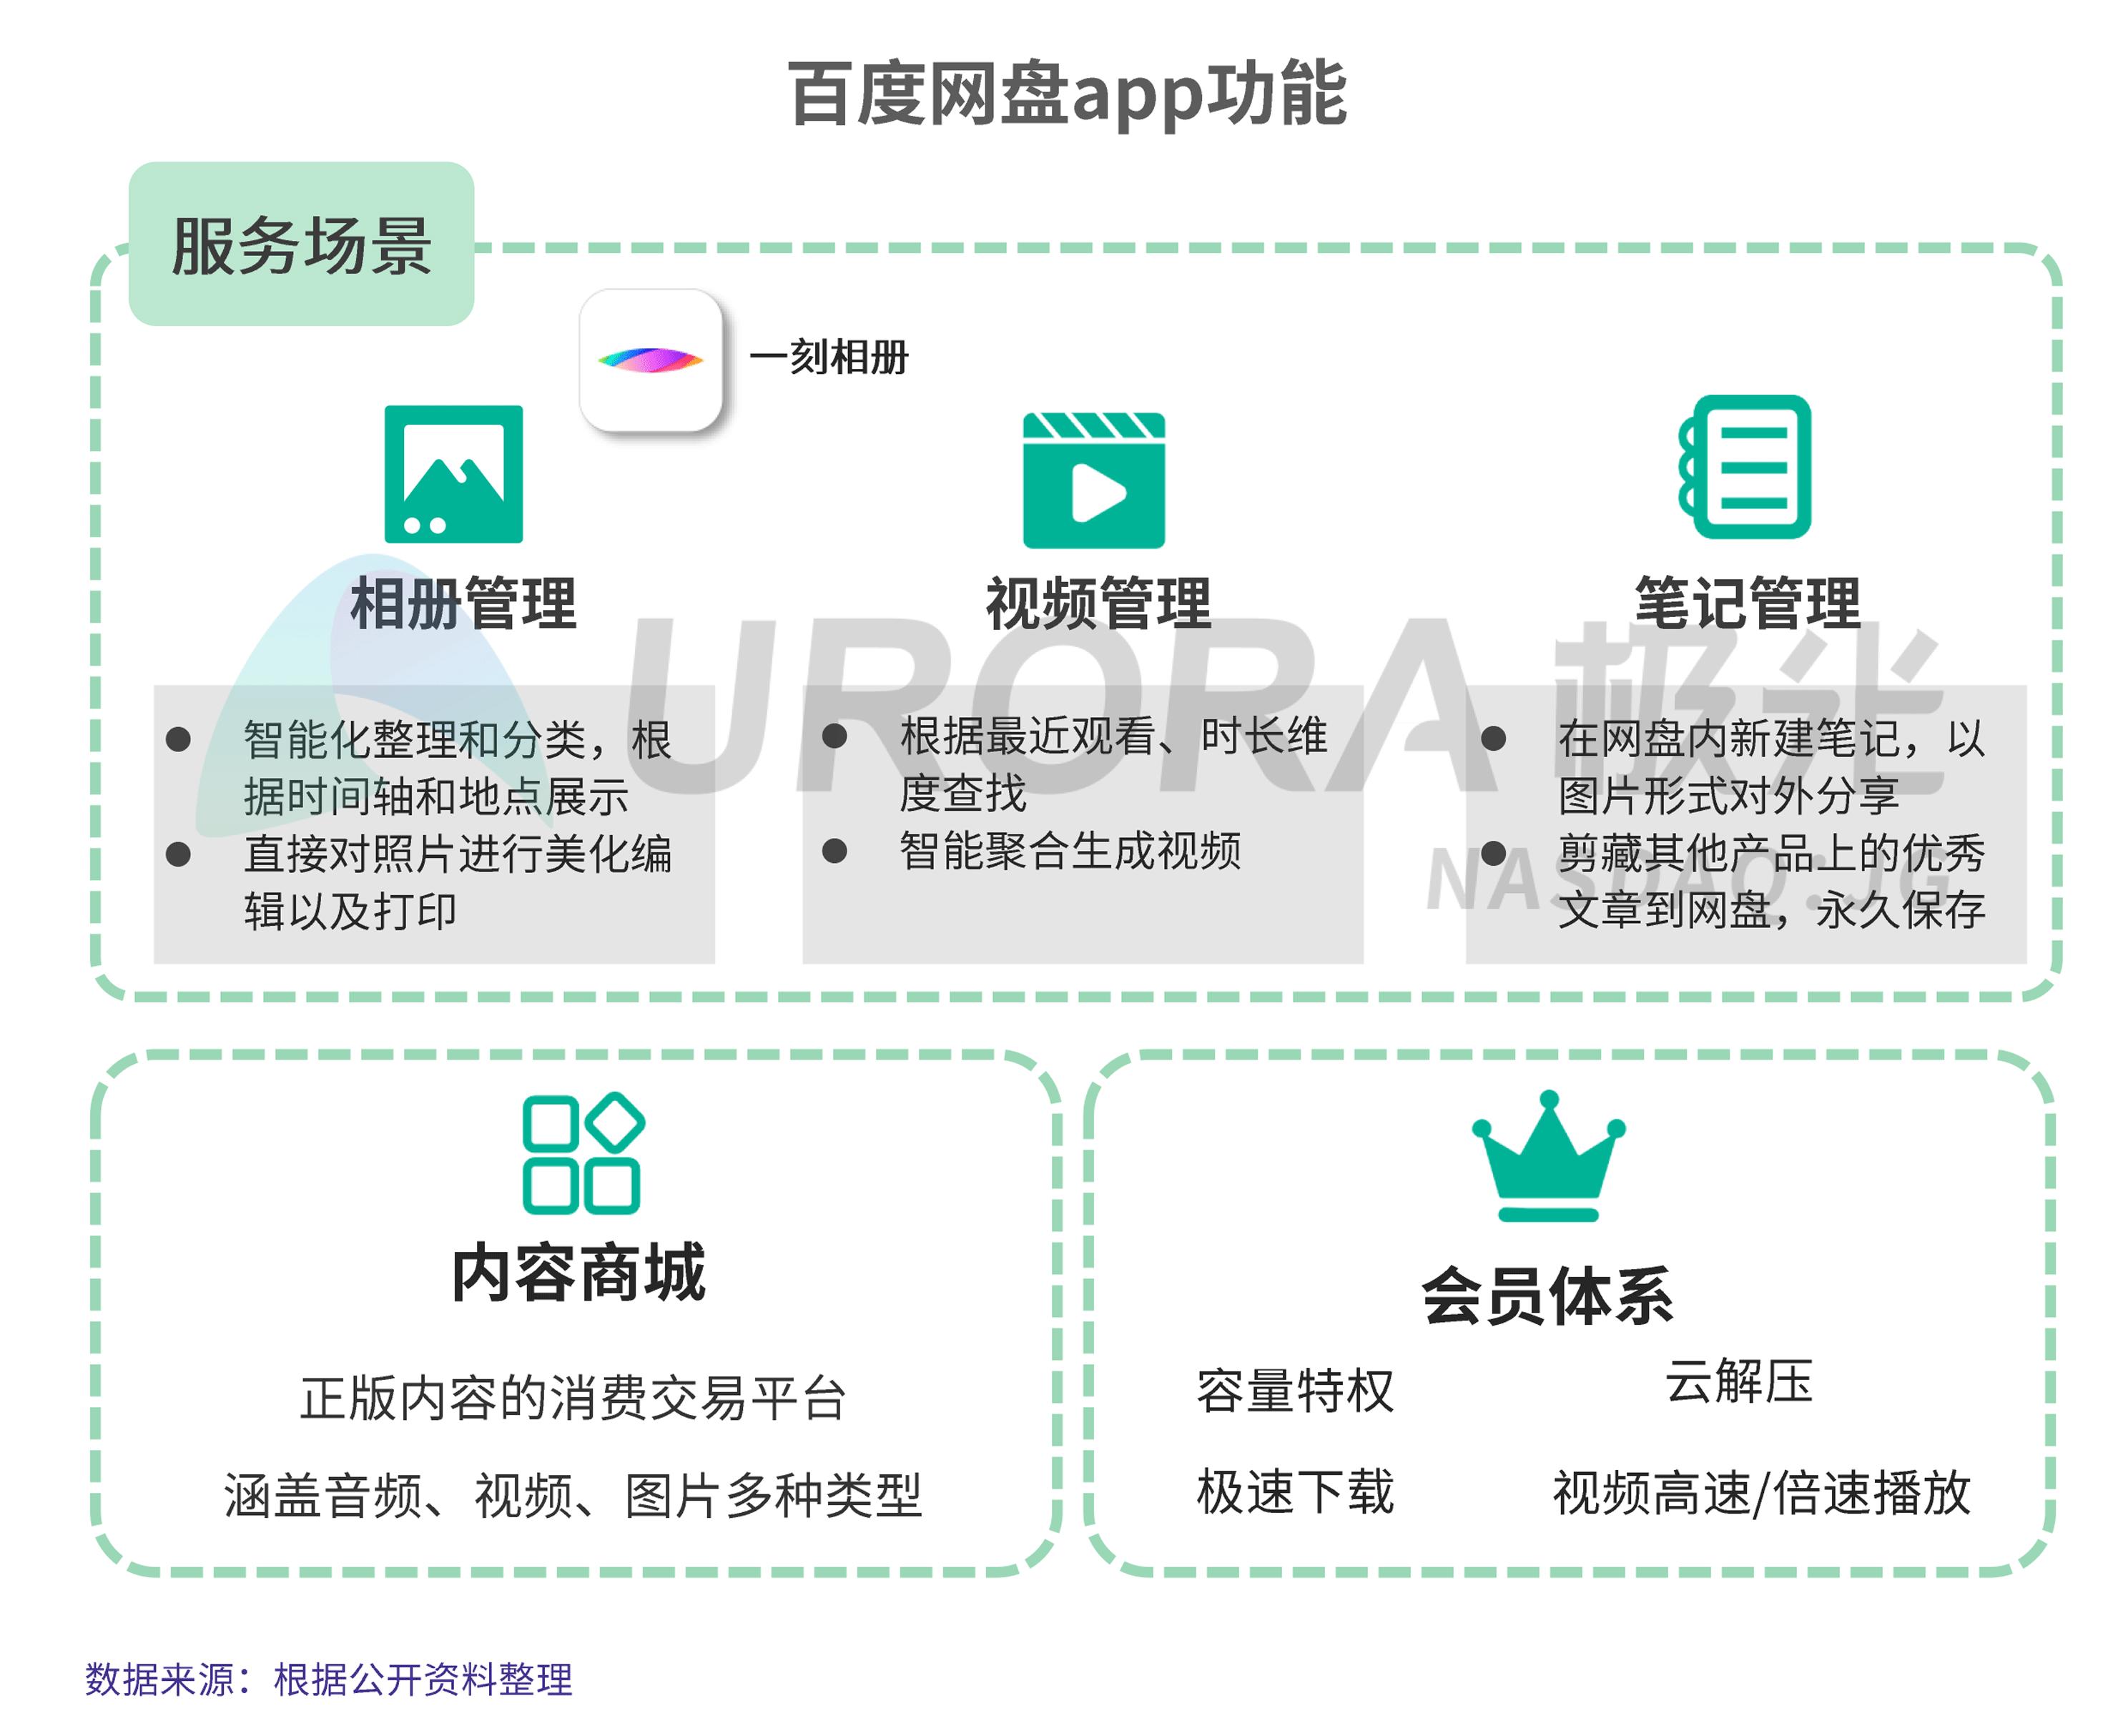 JIGUANG-个人网盘行业研究报告-final---切图版2-25.png